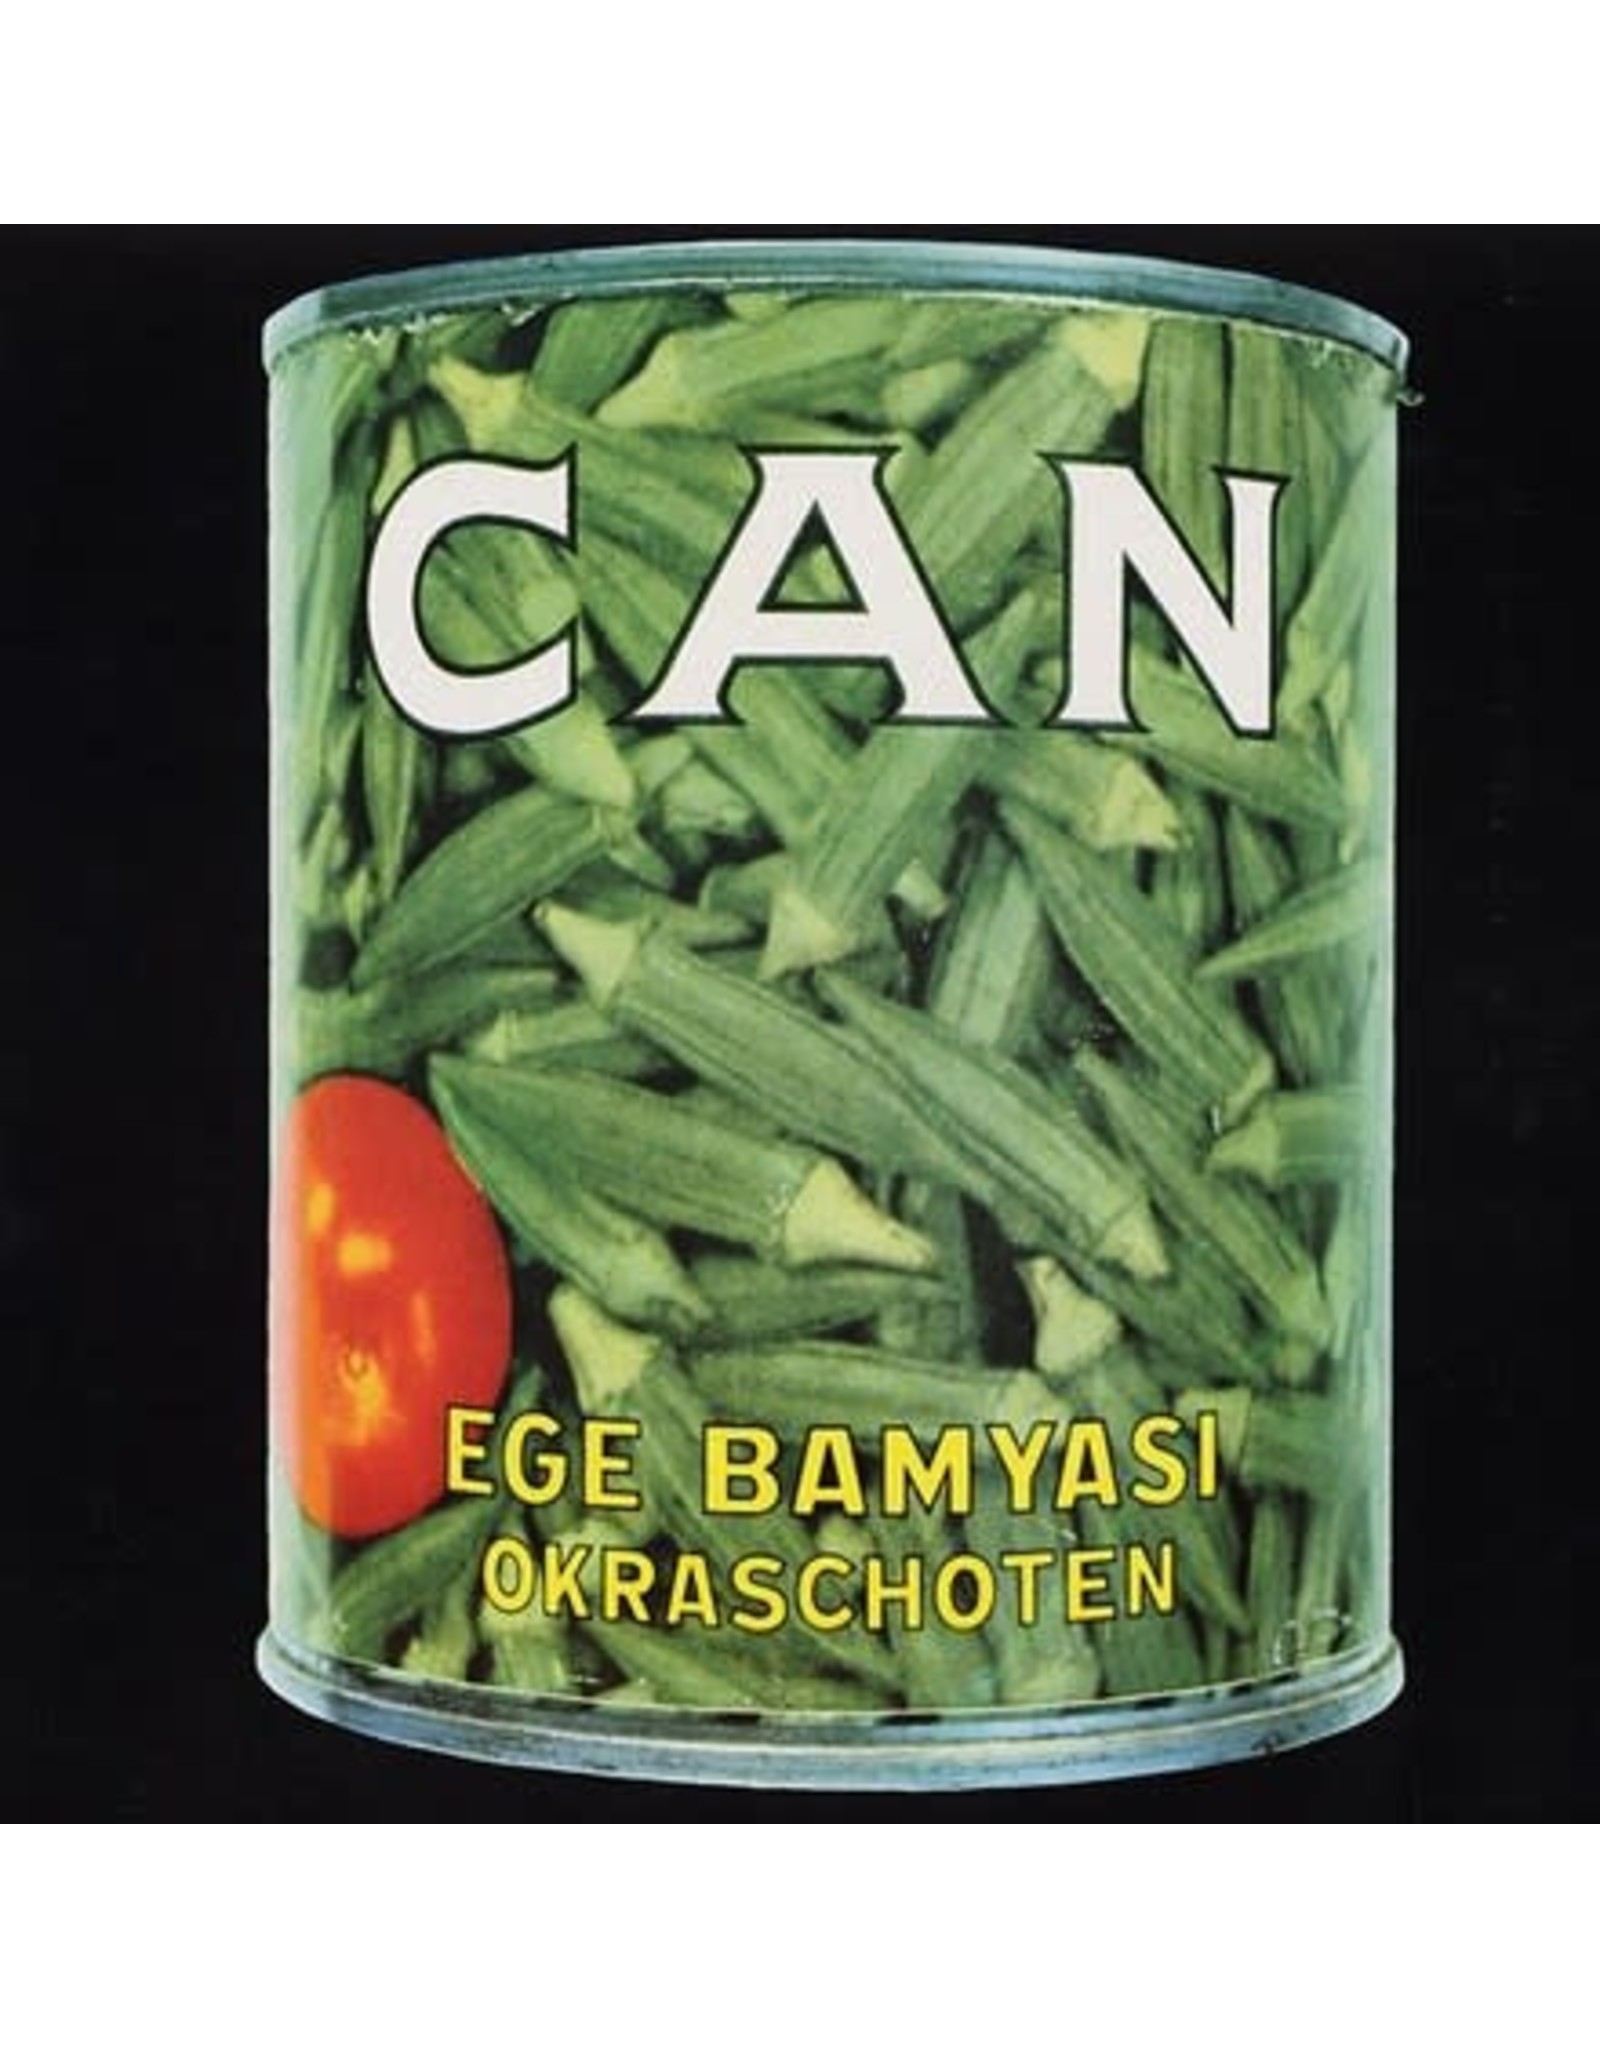 Spoon Can: Ege Bamyasi LP